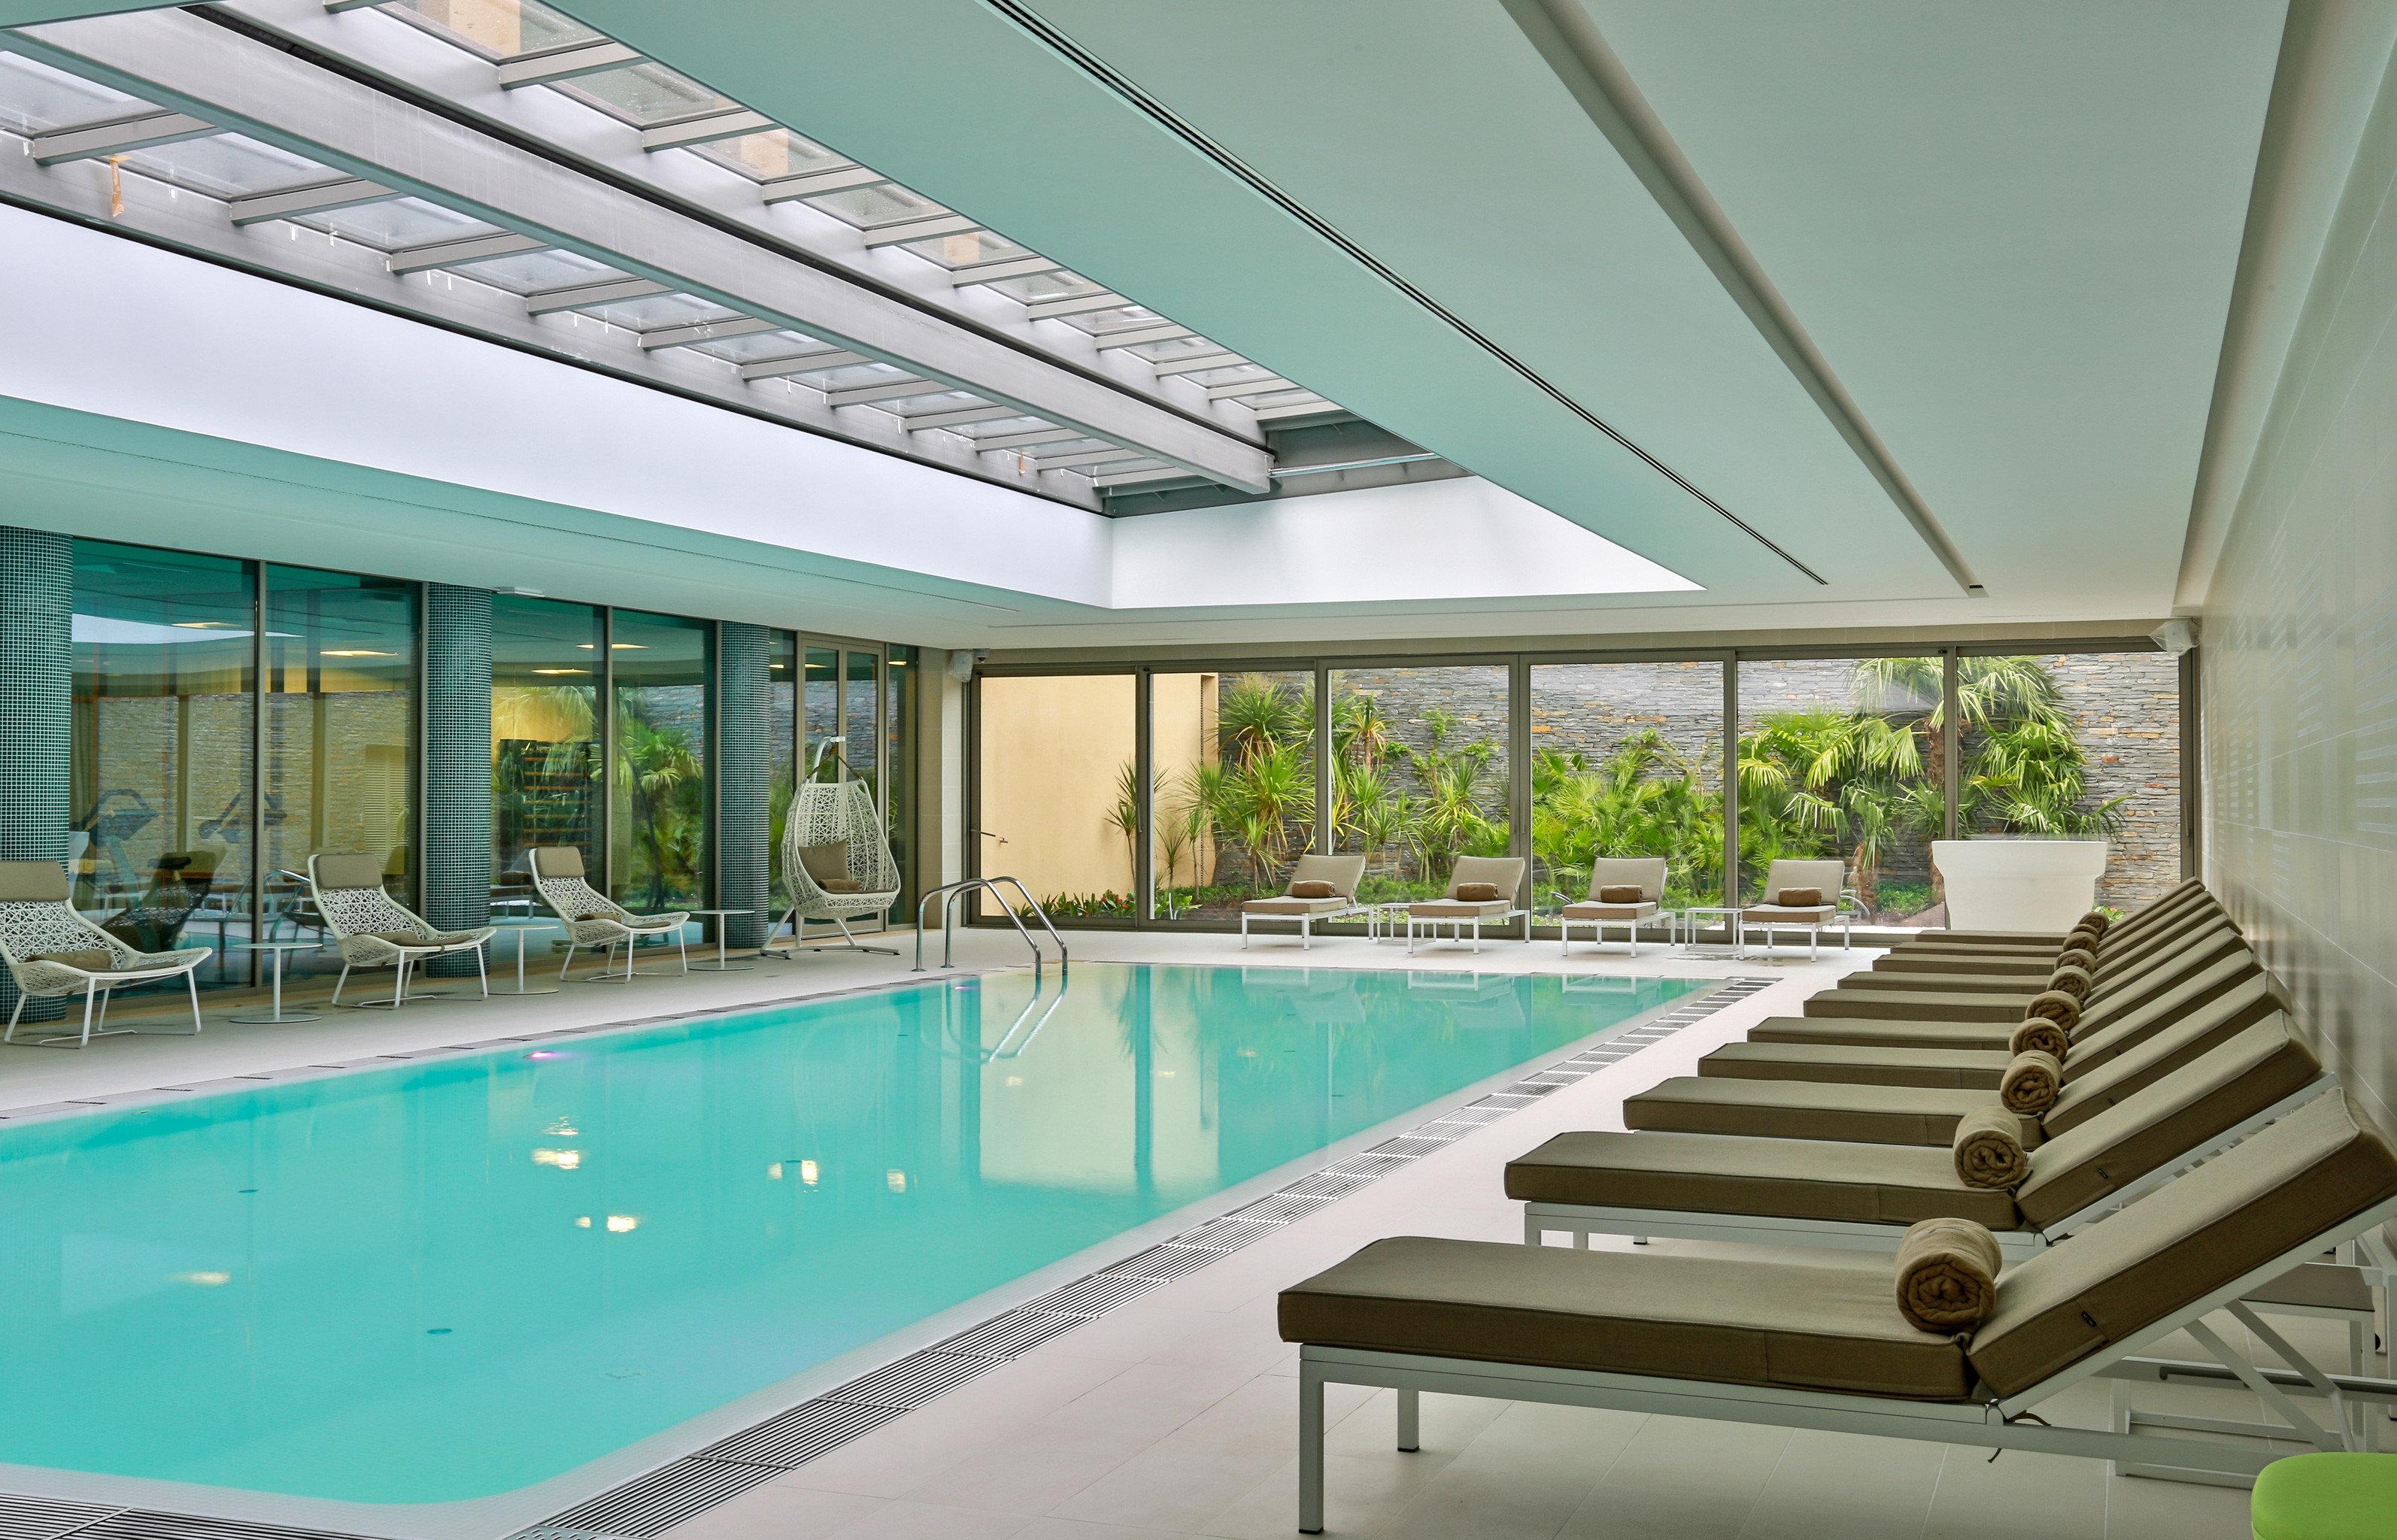 Lounge Pool Scenic views swimming pool property building condominium green Villa home daylighting Resort mansion Deck